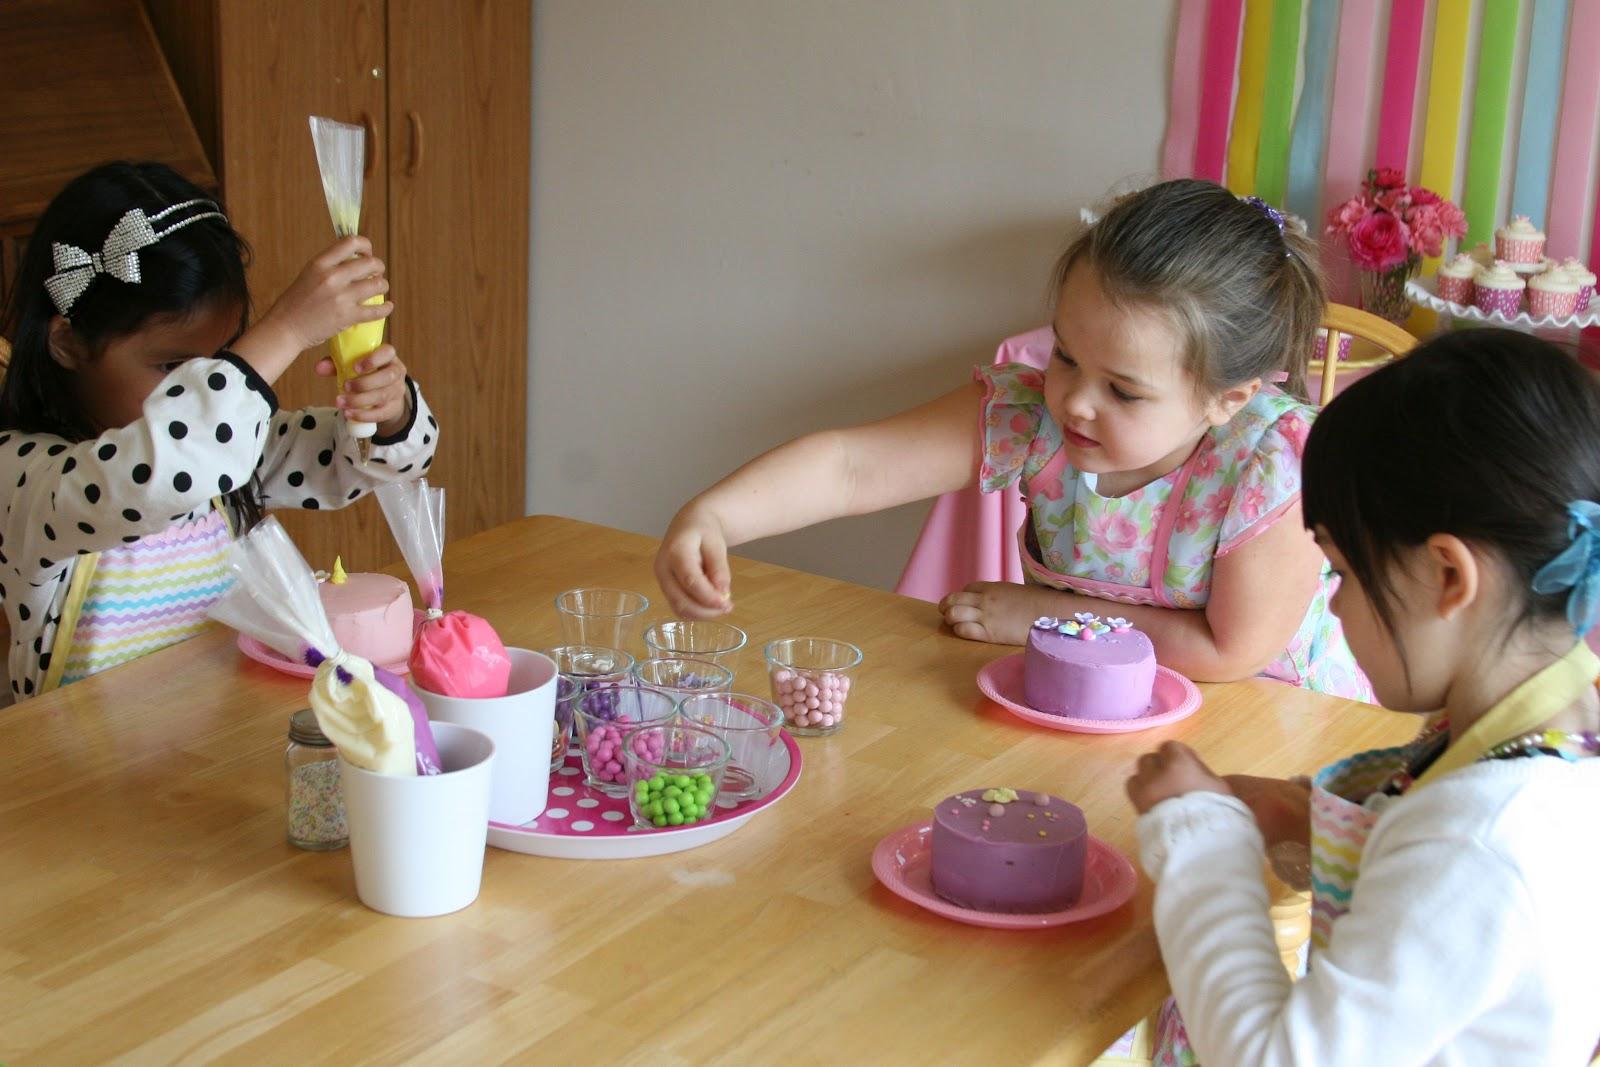 Graces Cake Decorating Party Glorious Treats